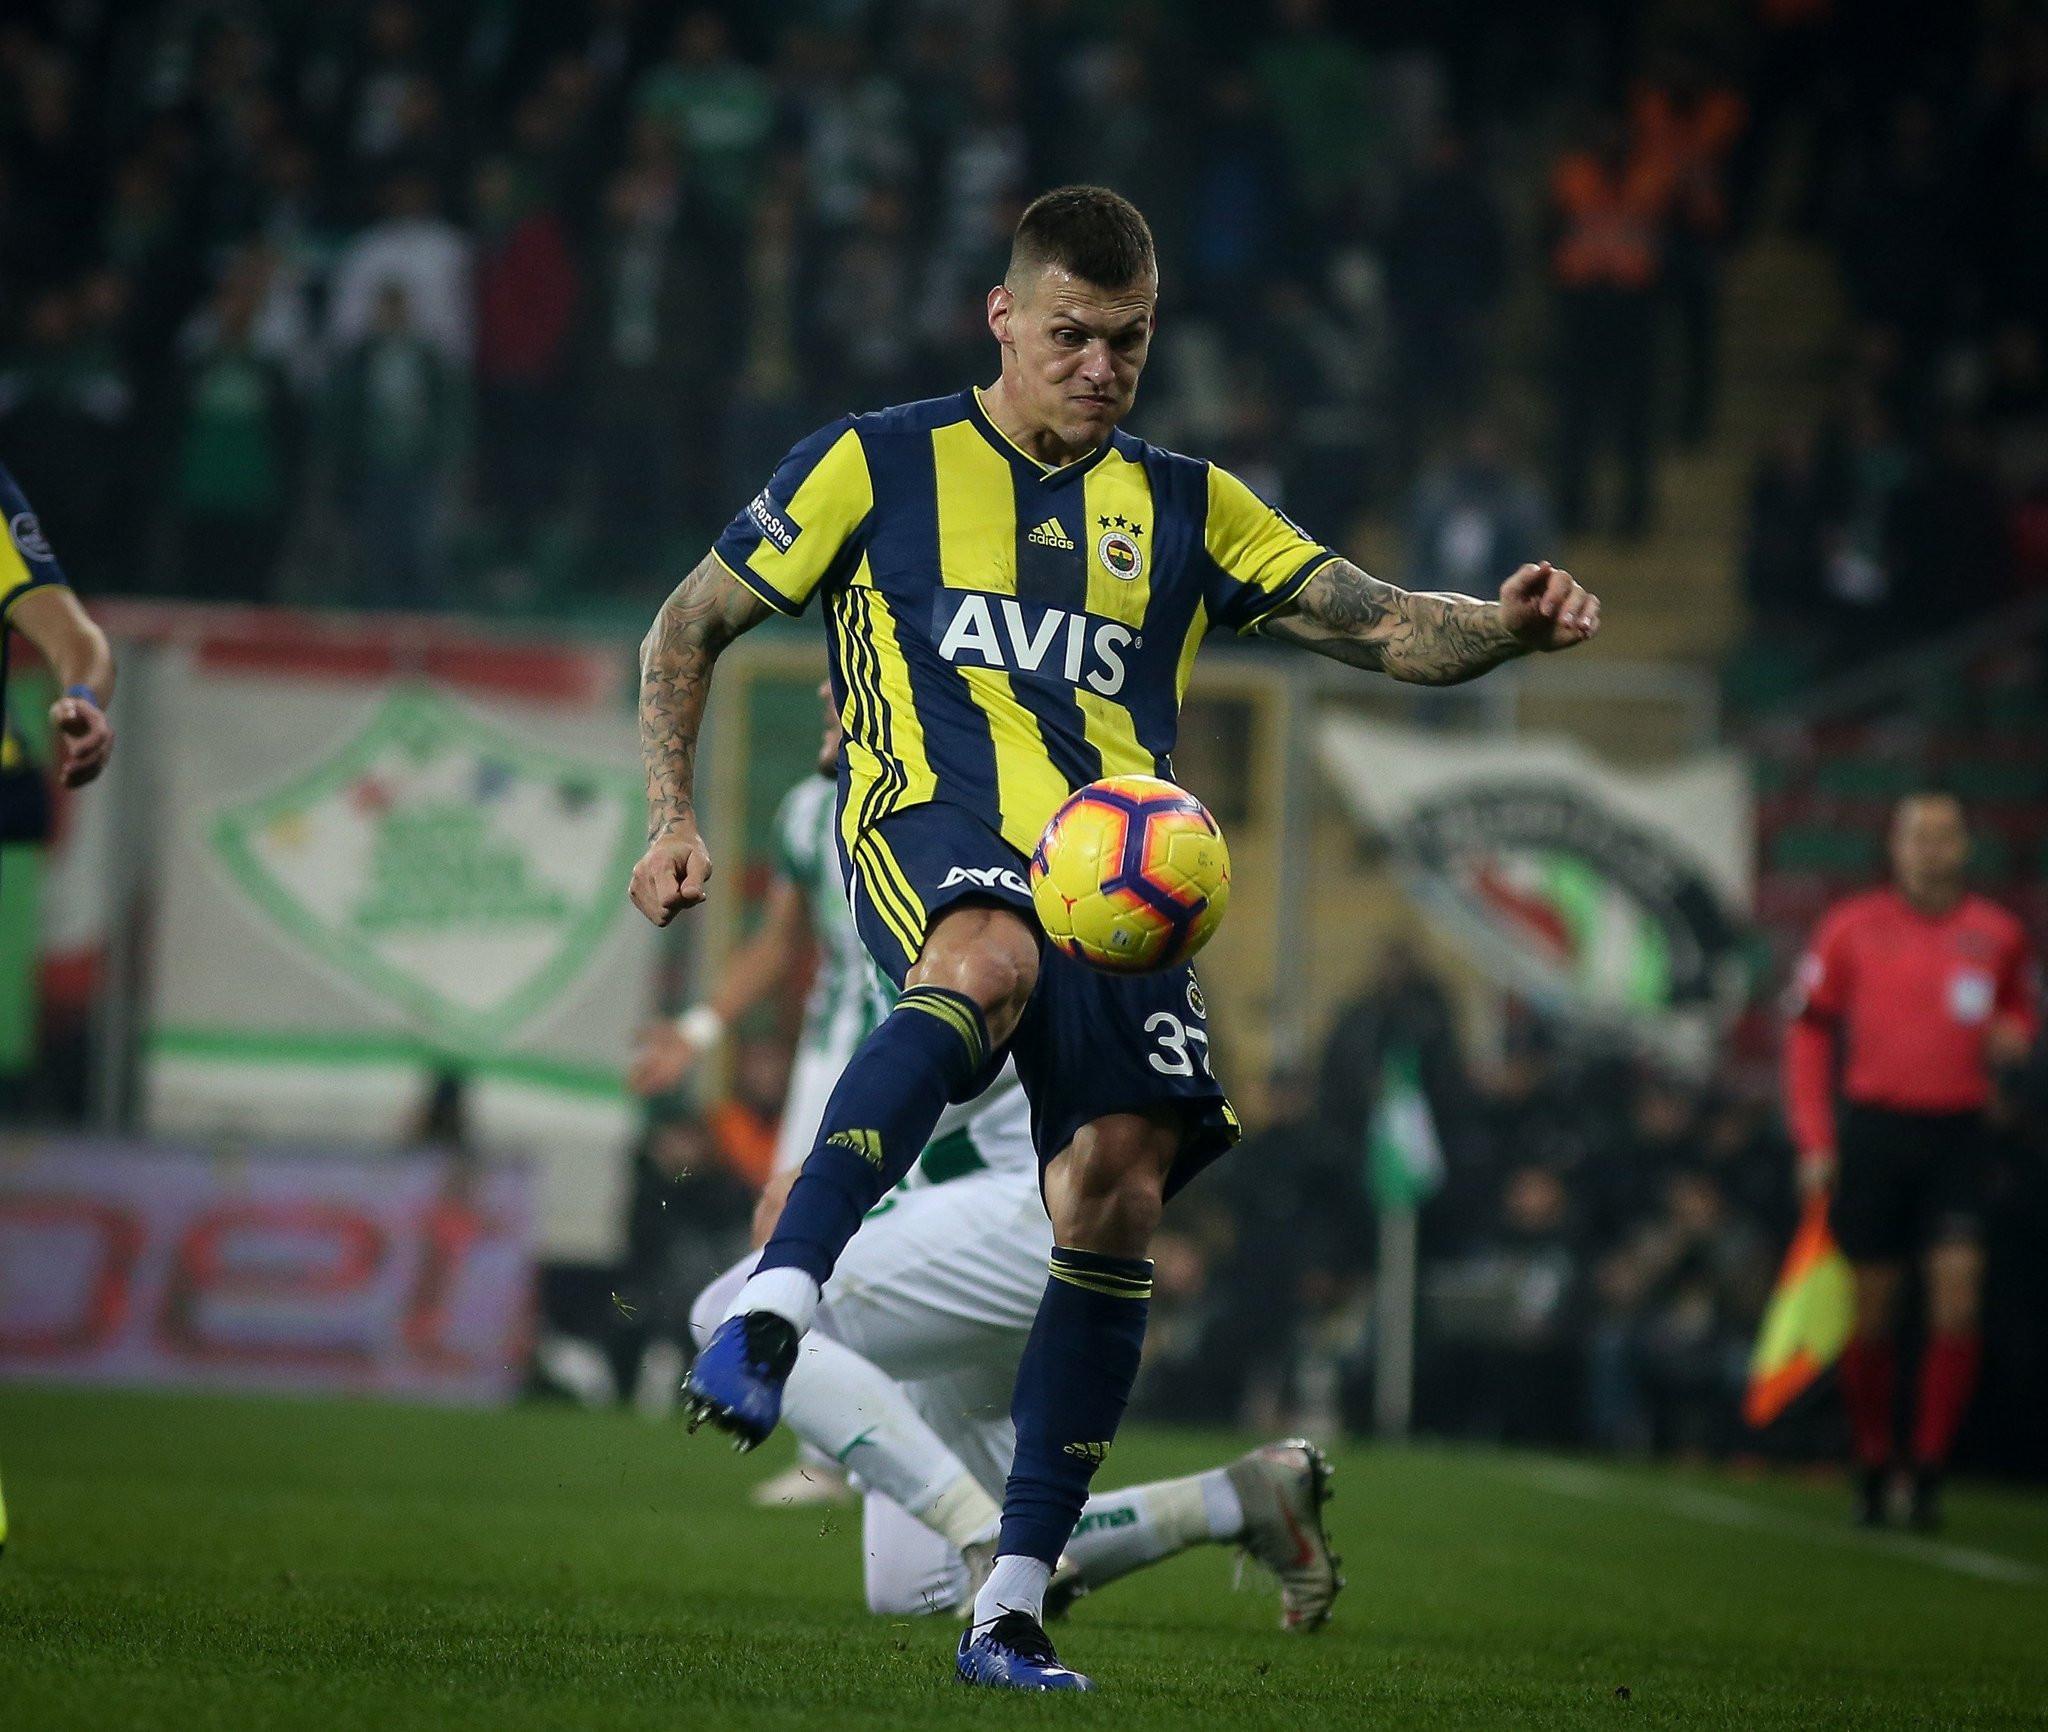 Fenerbahçe Skrtel'in yerine onu getirecek